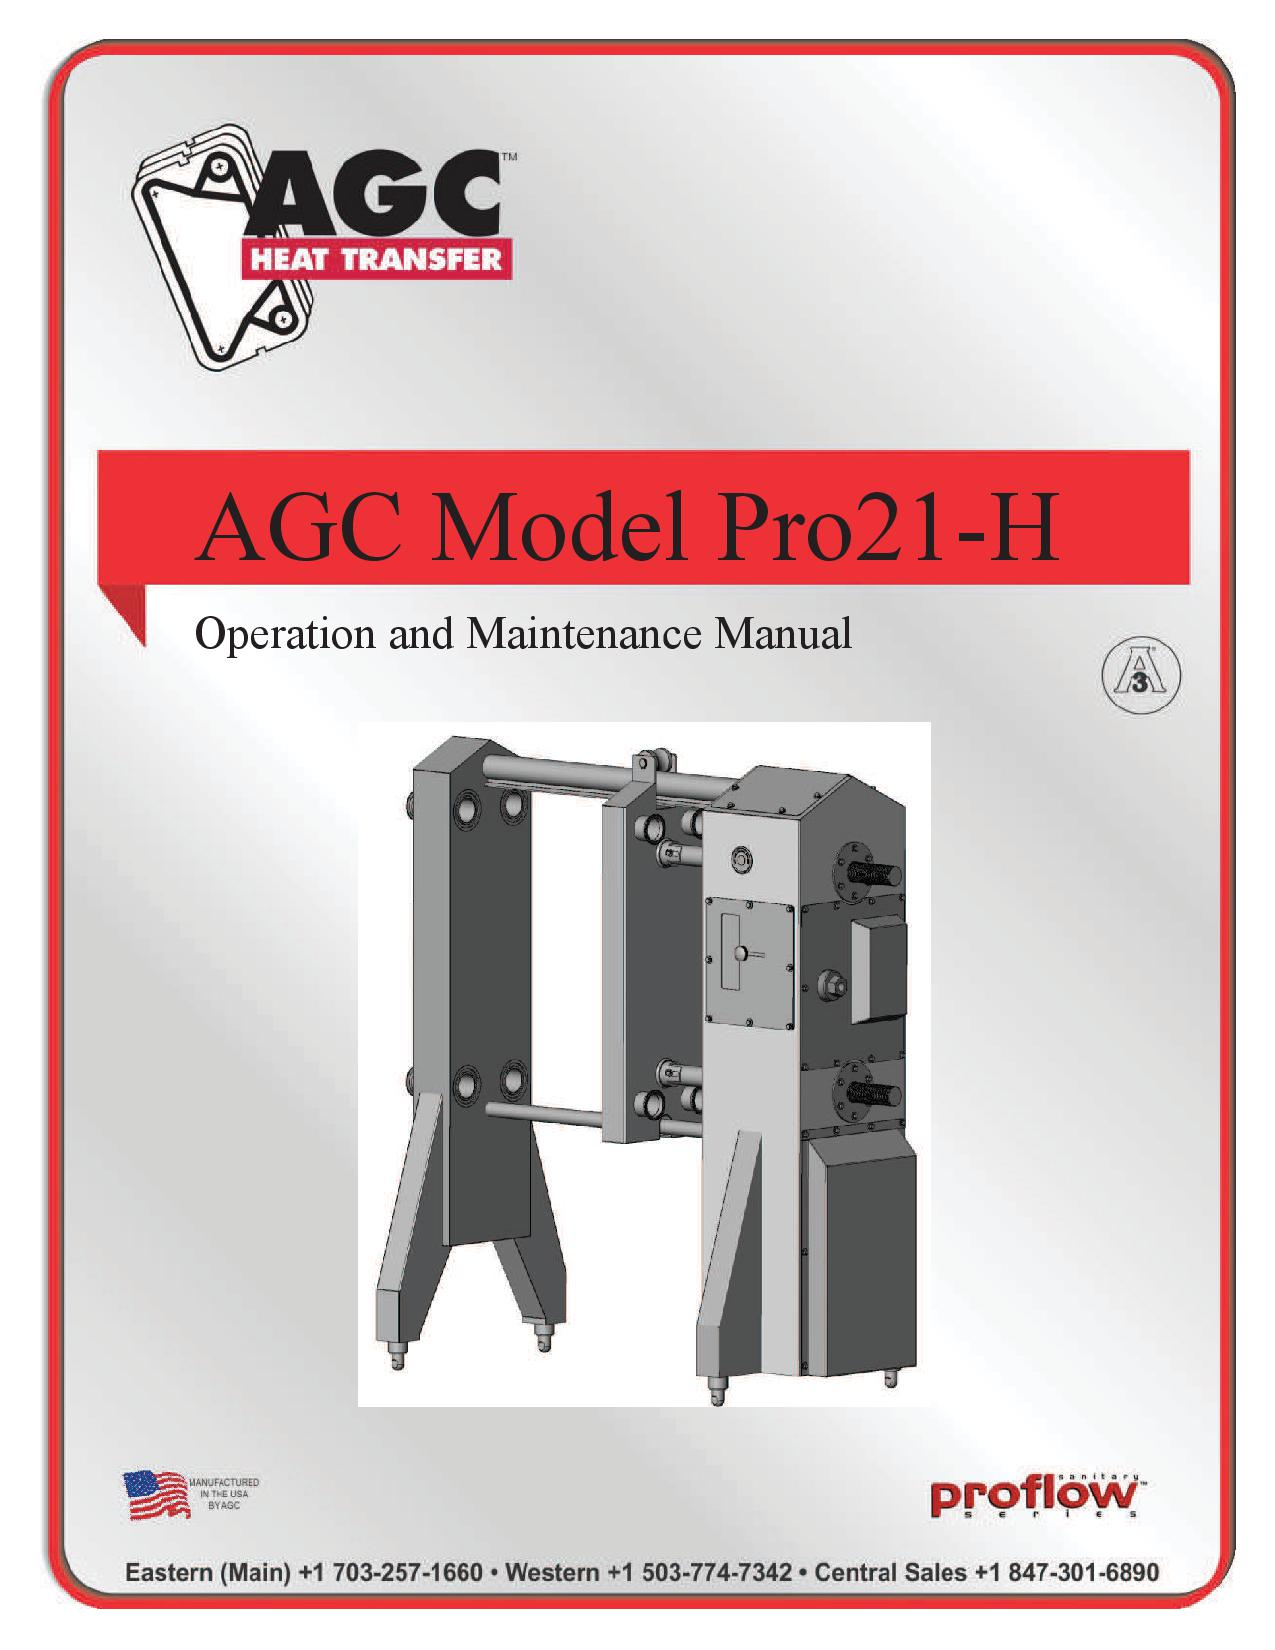 AGC Operating Manual Pro21-H